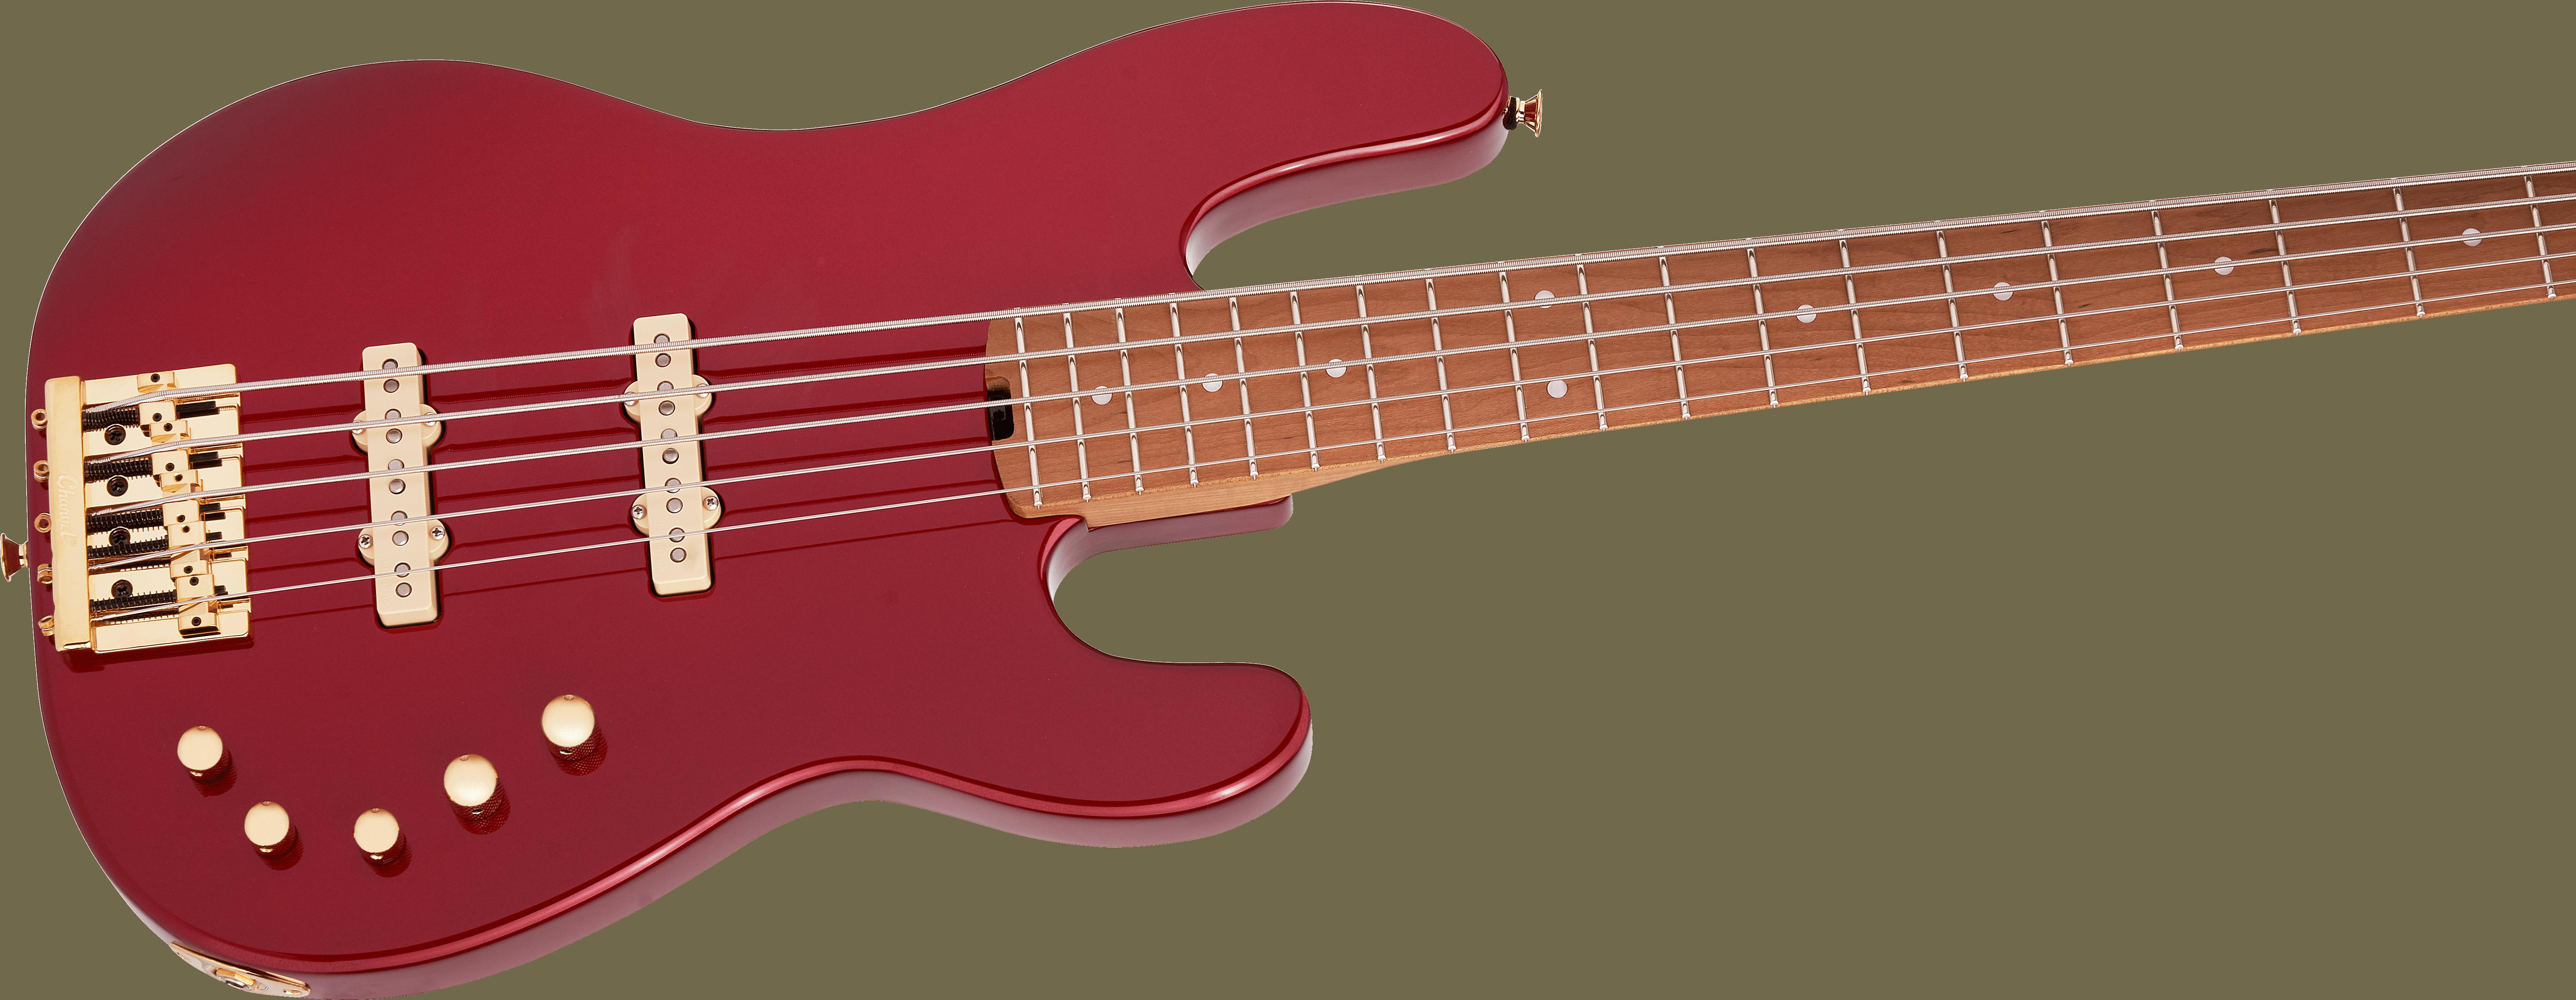 Charvel Pro-Mod San Dimas® Bass JJ V, Caramelized Maple Fingerboard, Candy Apple Red